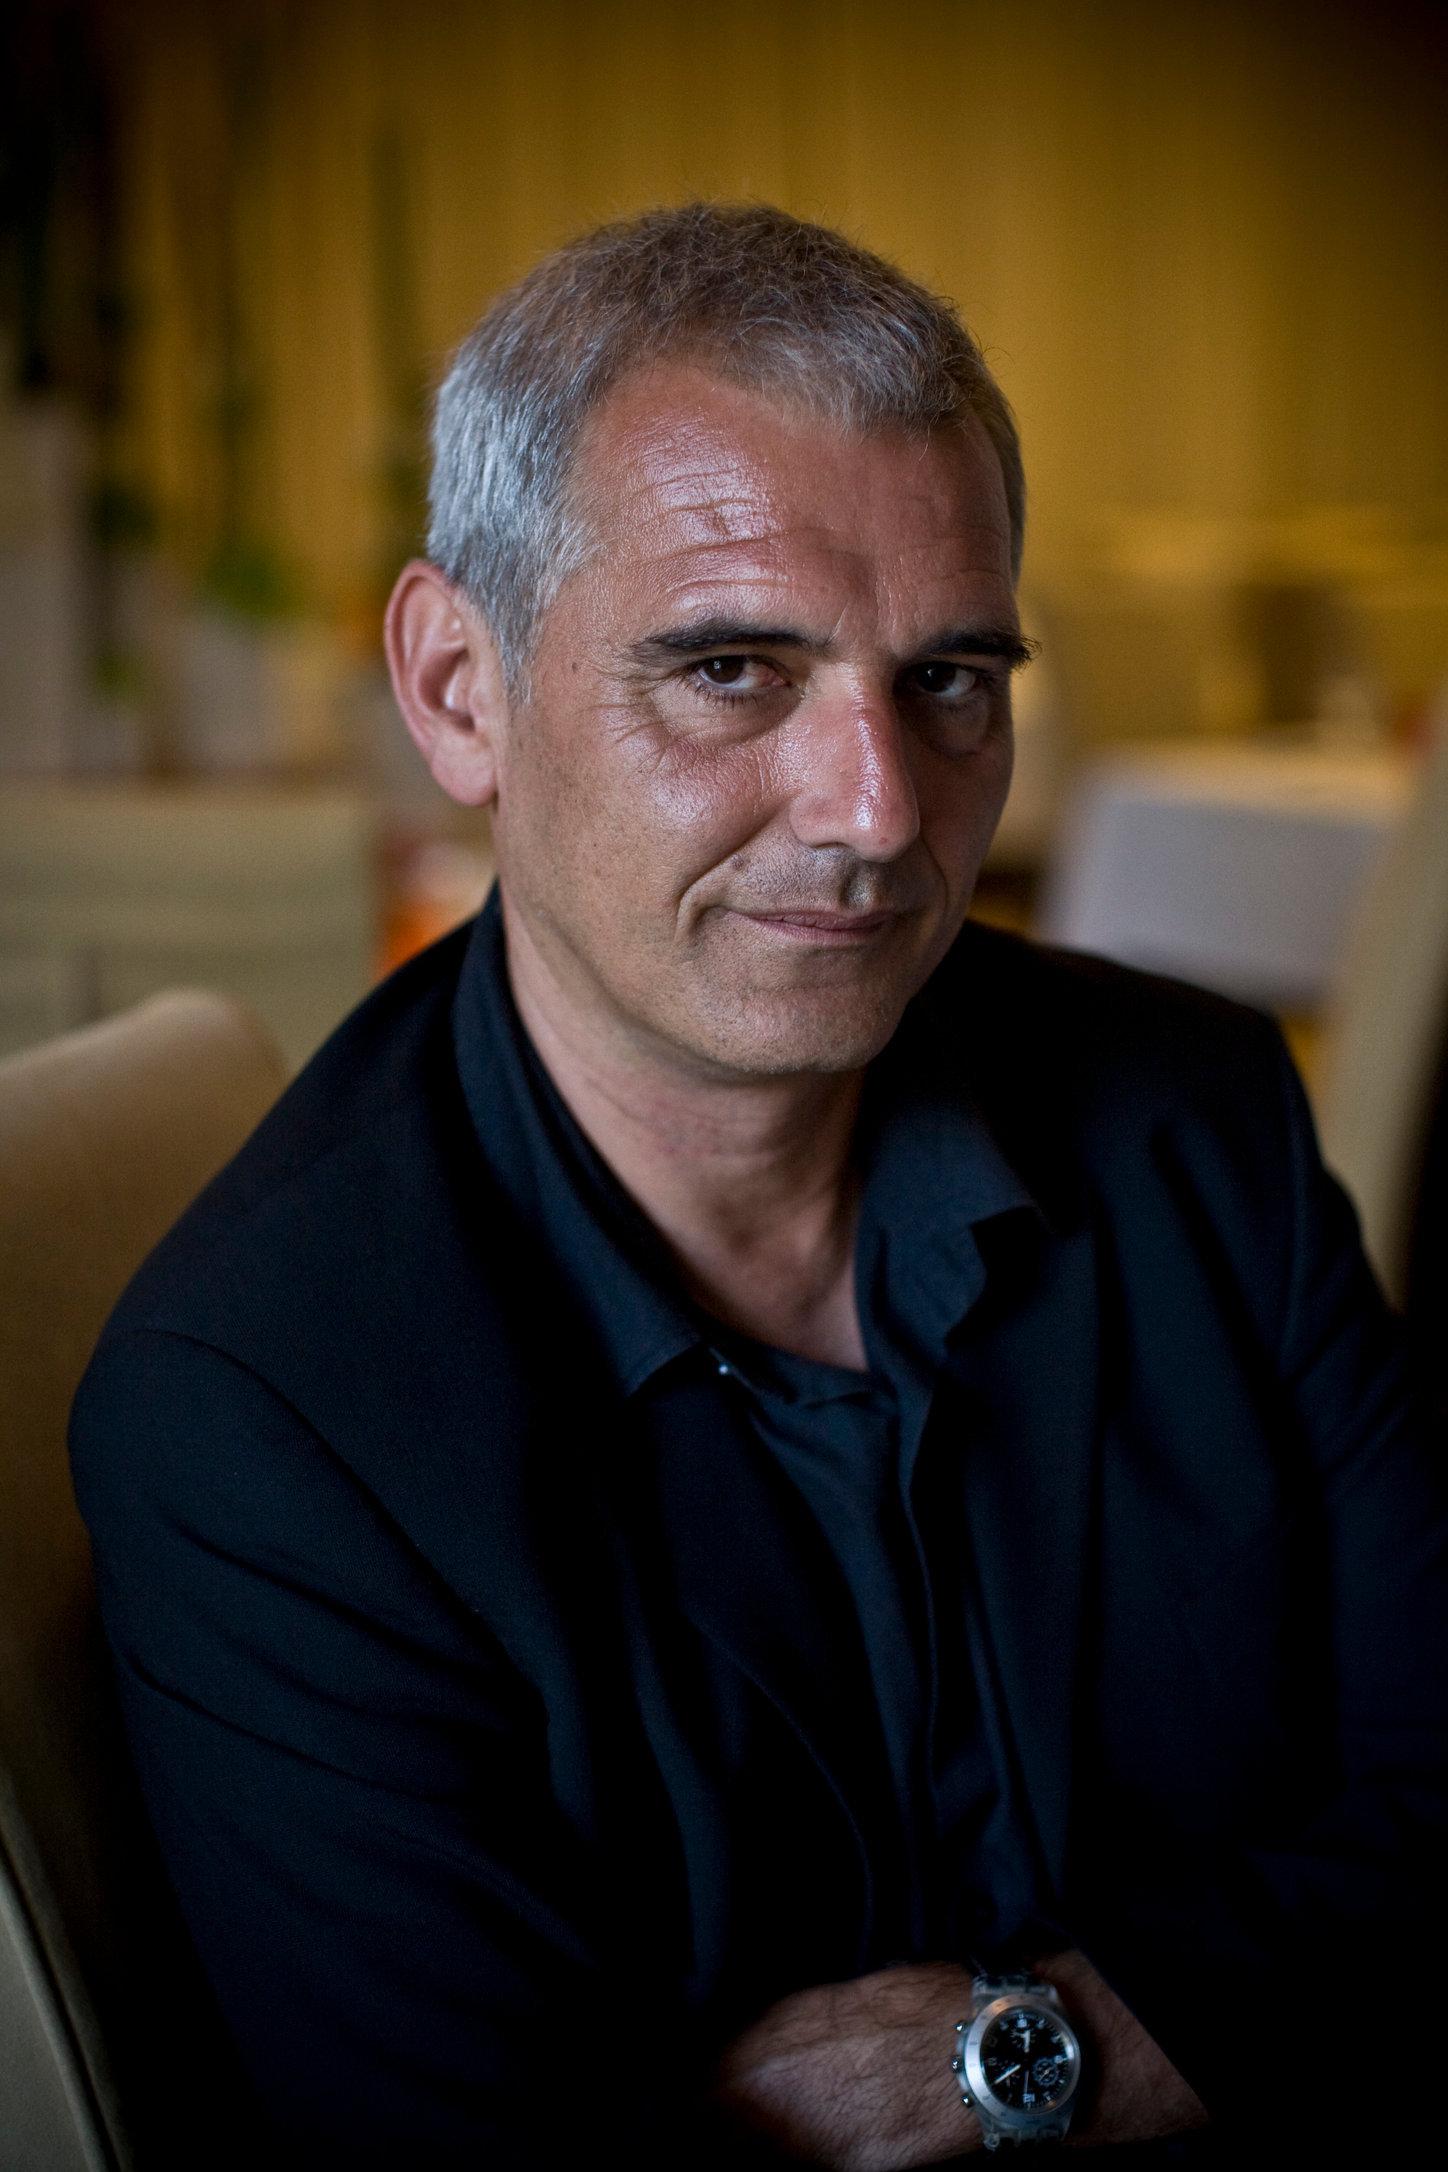 laurent cantet, director